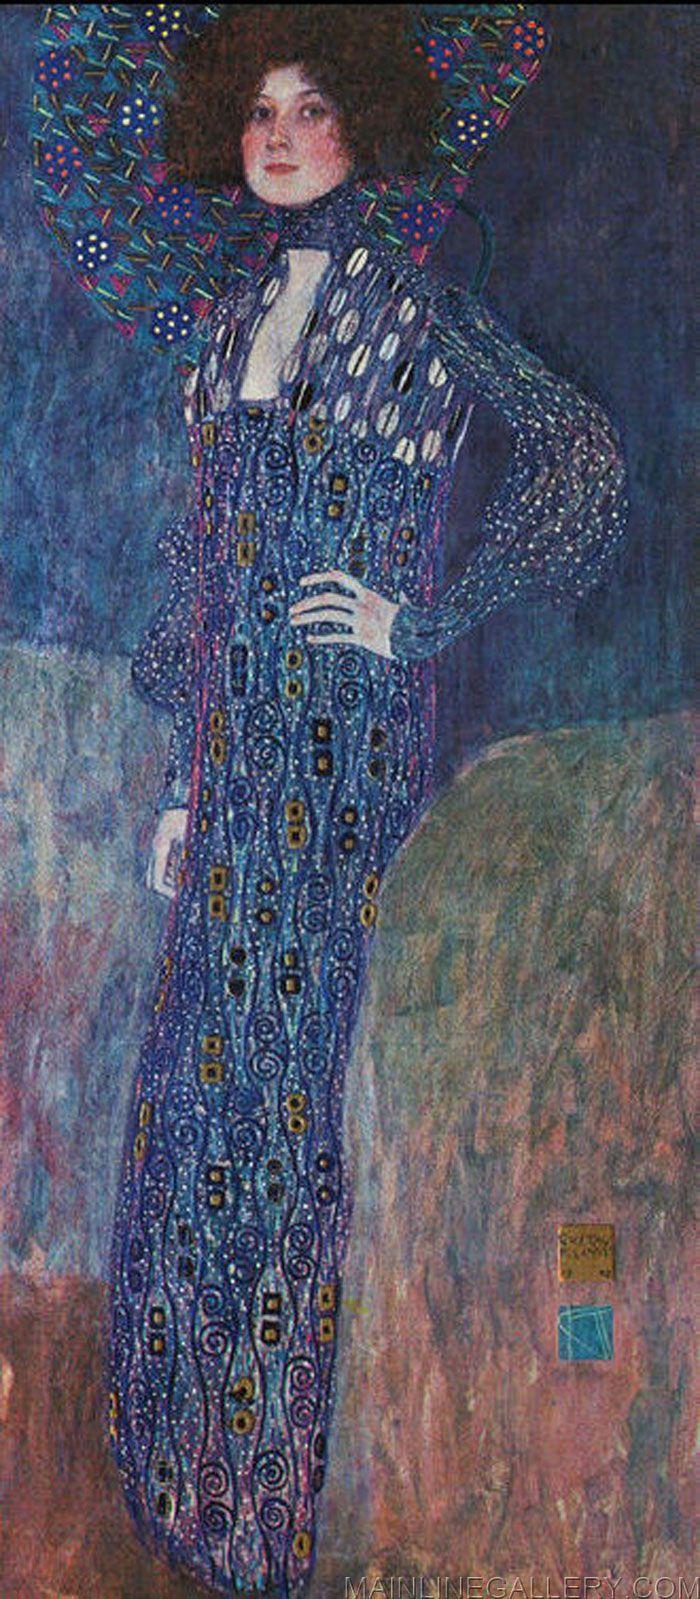 Gustav Klimt, Portrait of Emilie Flöge, 1902, oil on canvas, 178 x 80 cm, Historical Museum of the City of Vienna, Vienna